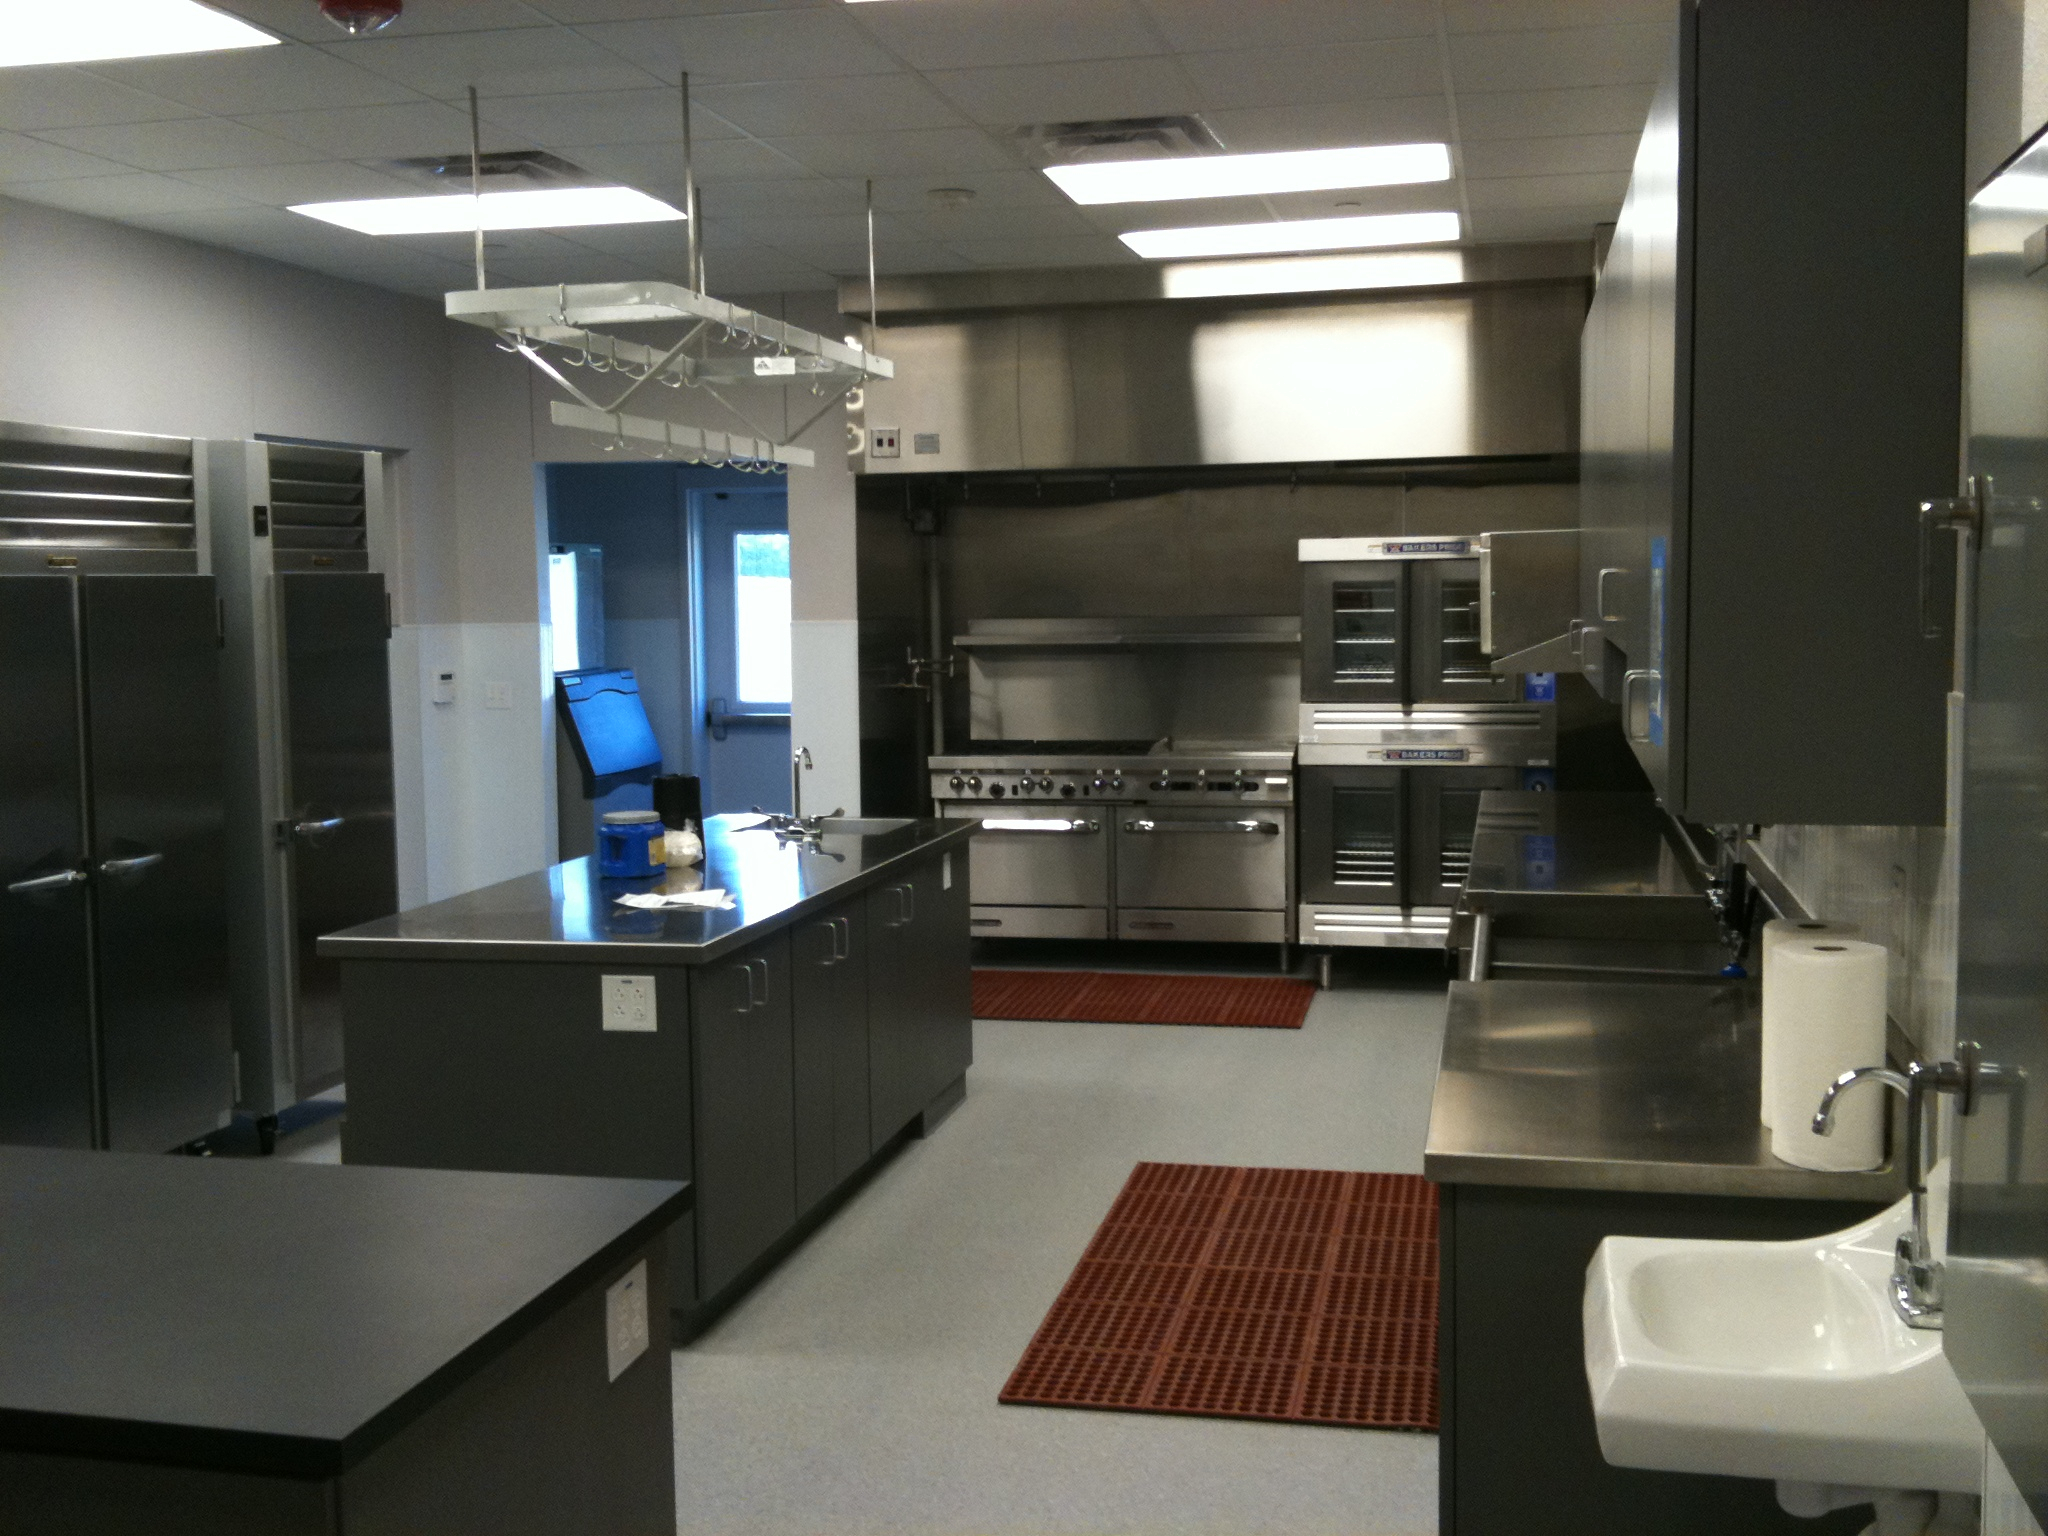 Designing Church Kitchens Part 1